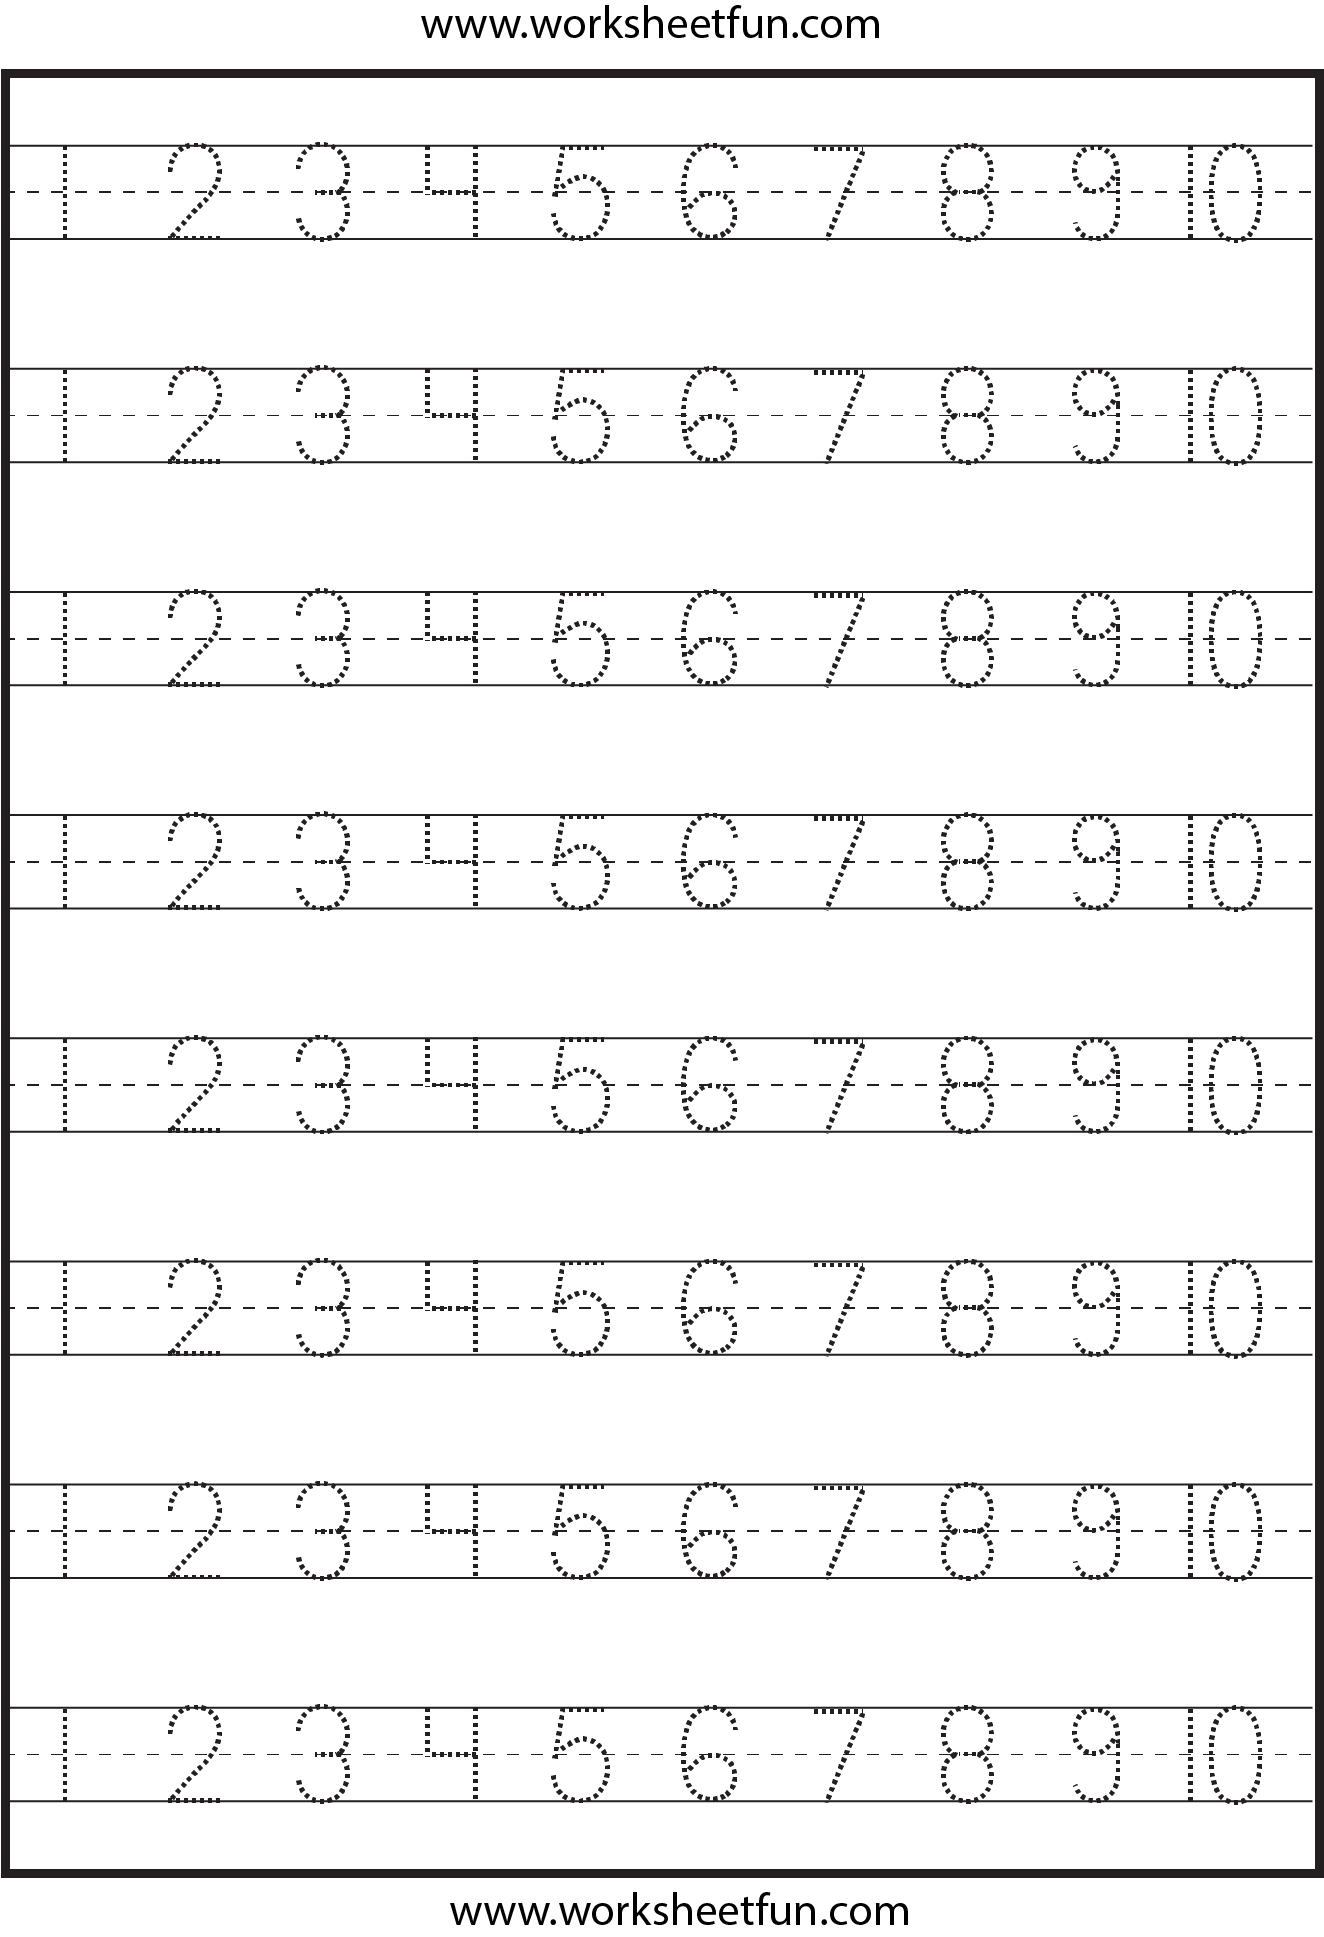 Image Result For Number Counting Worksheets Kindergarten Worksheets Pinterest Free Preschool Worksheets Printable Preschool Worksheets Numbers Preschool [ 1937 x 1324 Pixel ]